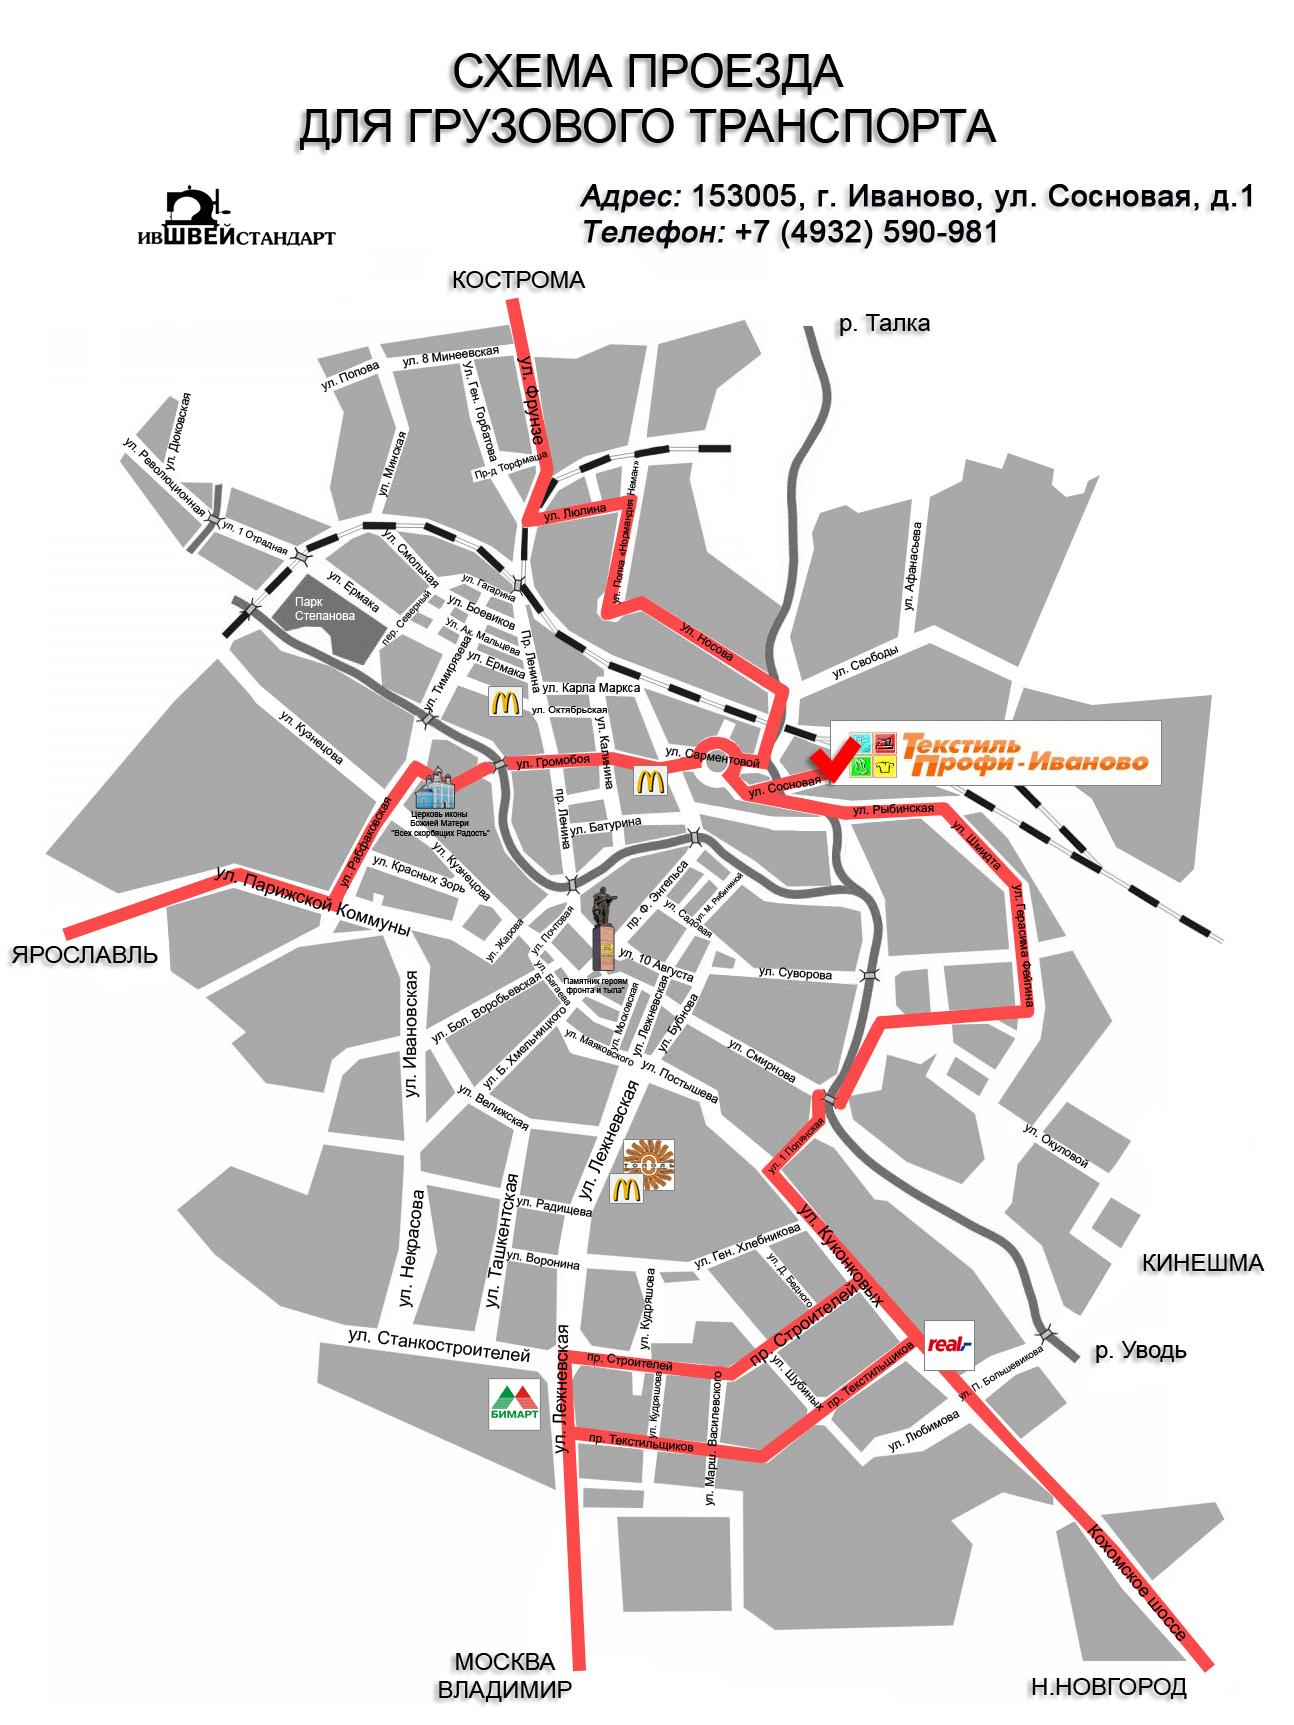 Схема проезда на общественном транспорте по иваново